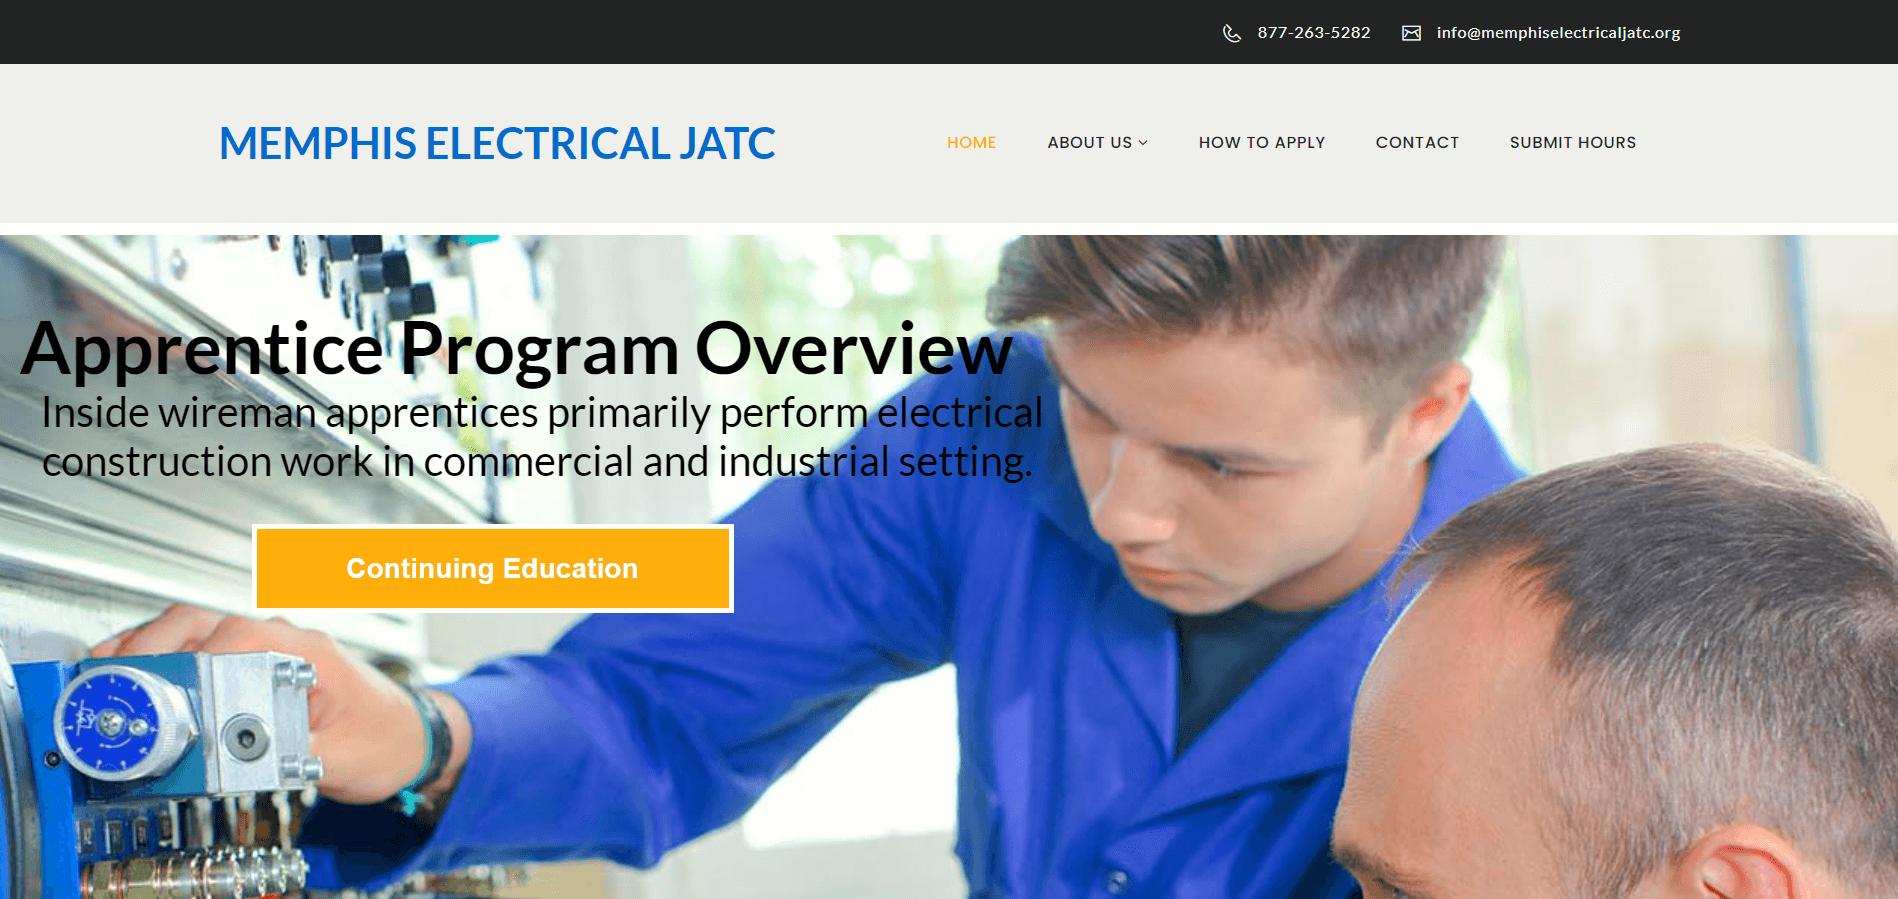 memphis electrical jatc